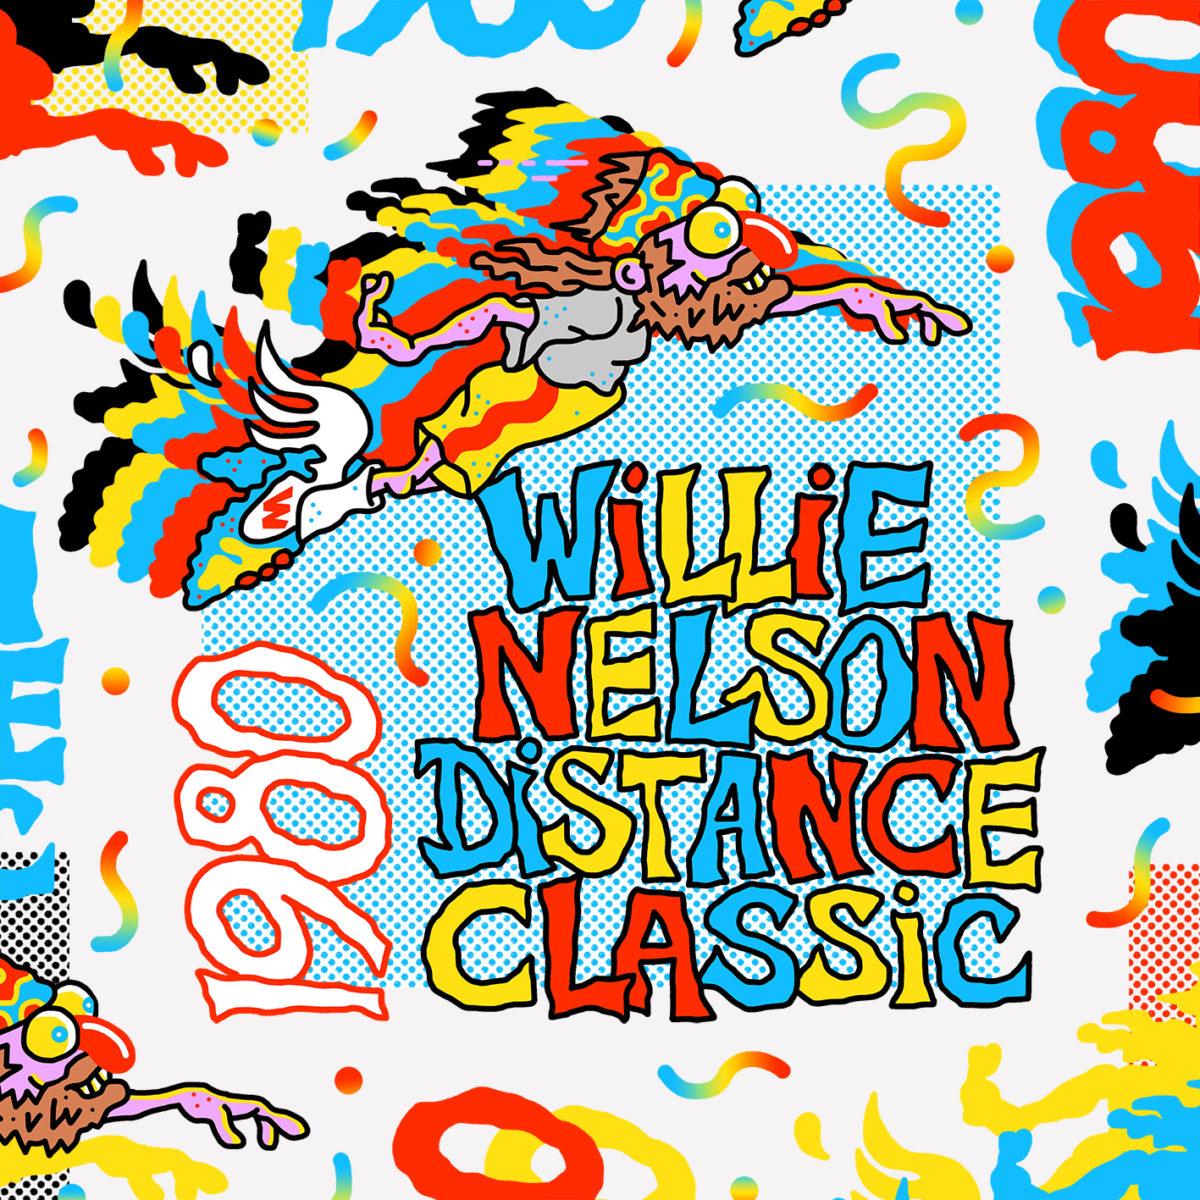 Sam Taylor willie distance classic web